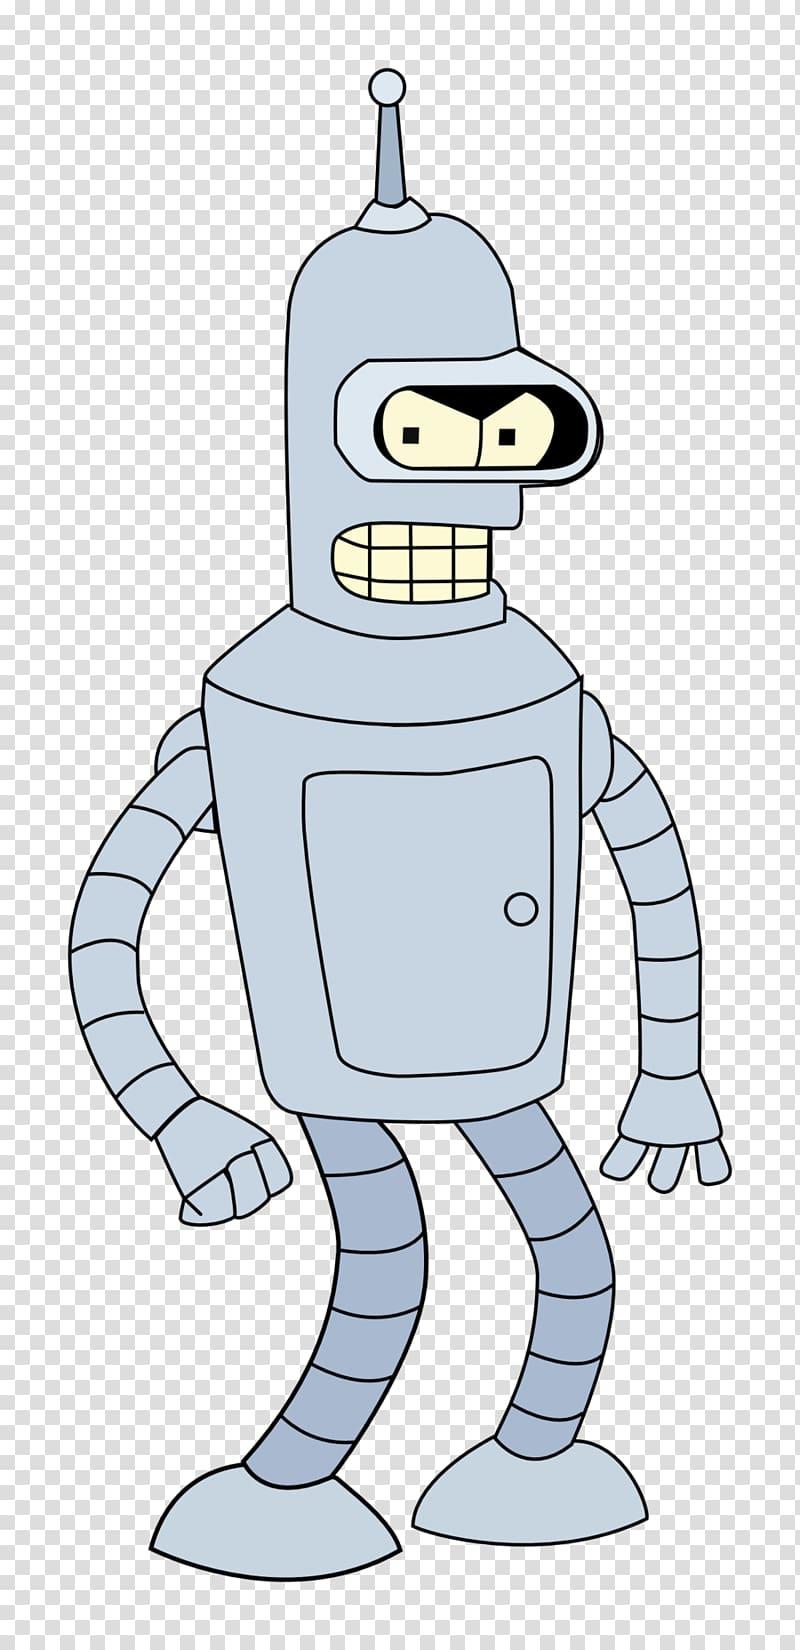 Leela Bender Philip J. Fry Zoidberg Professor Farnsworth, Futurama.